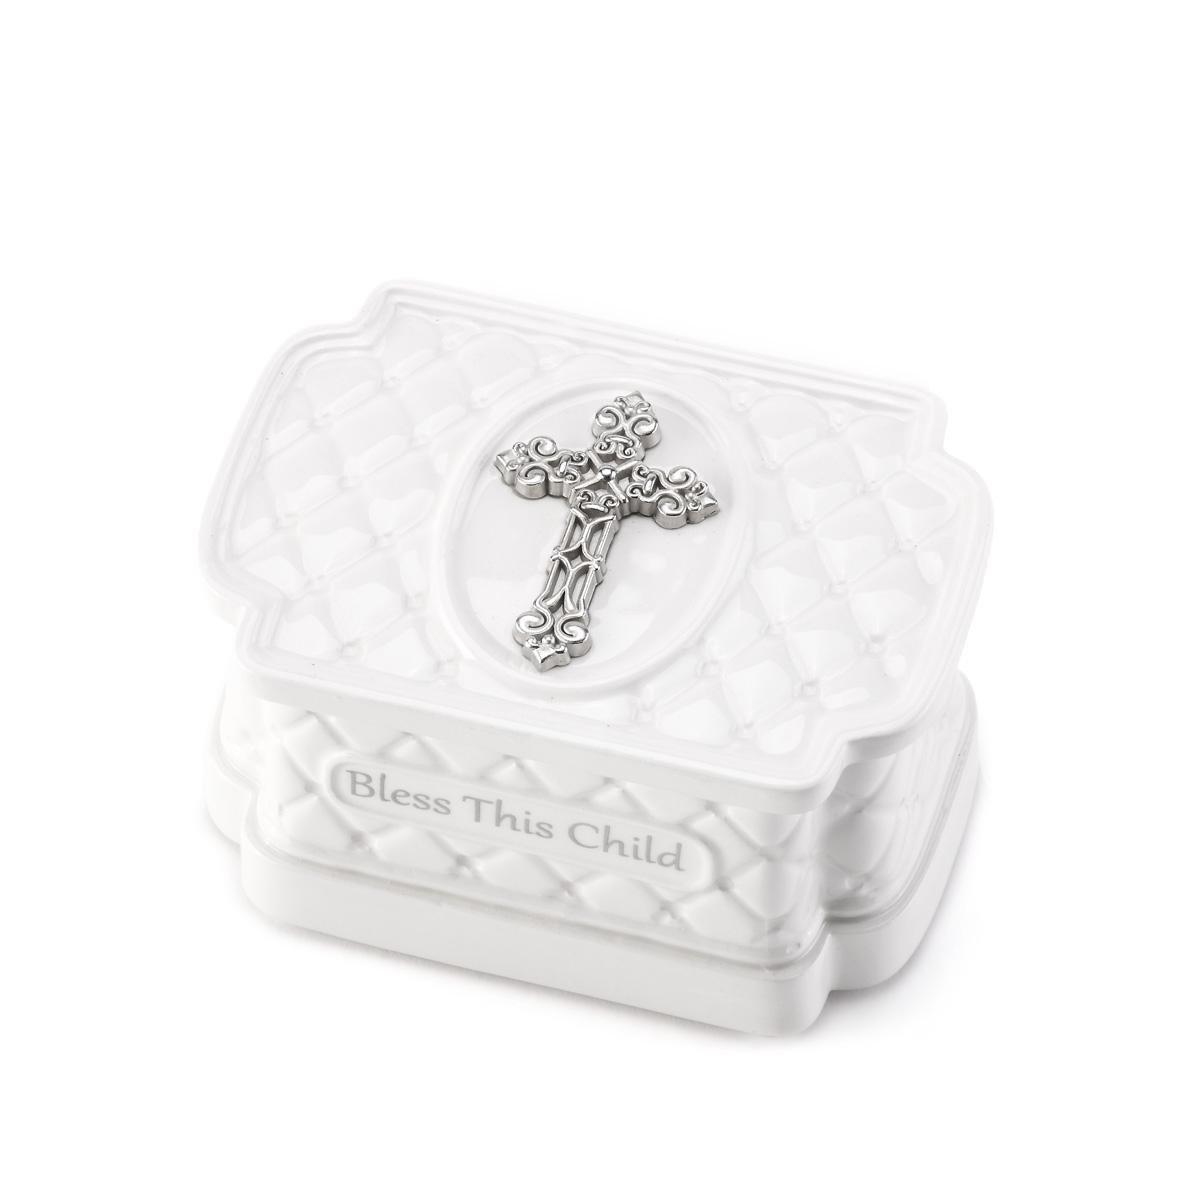 DEMDACO Bless This Child Classic White Dolomite Childrens Keepsake Box with Rosary